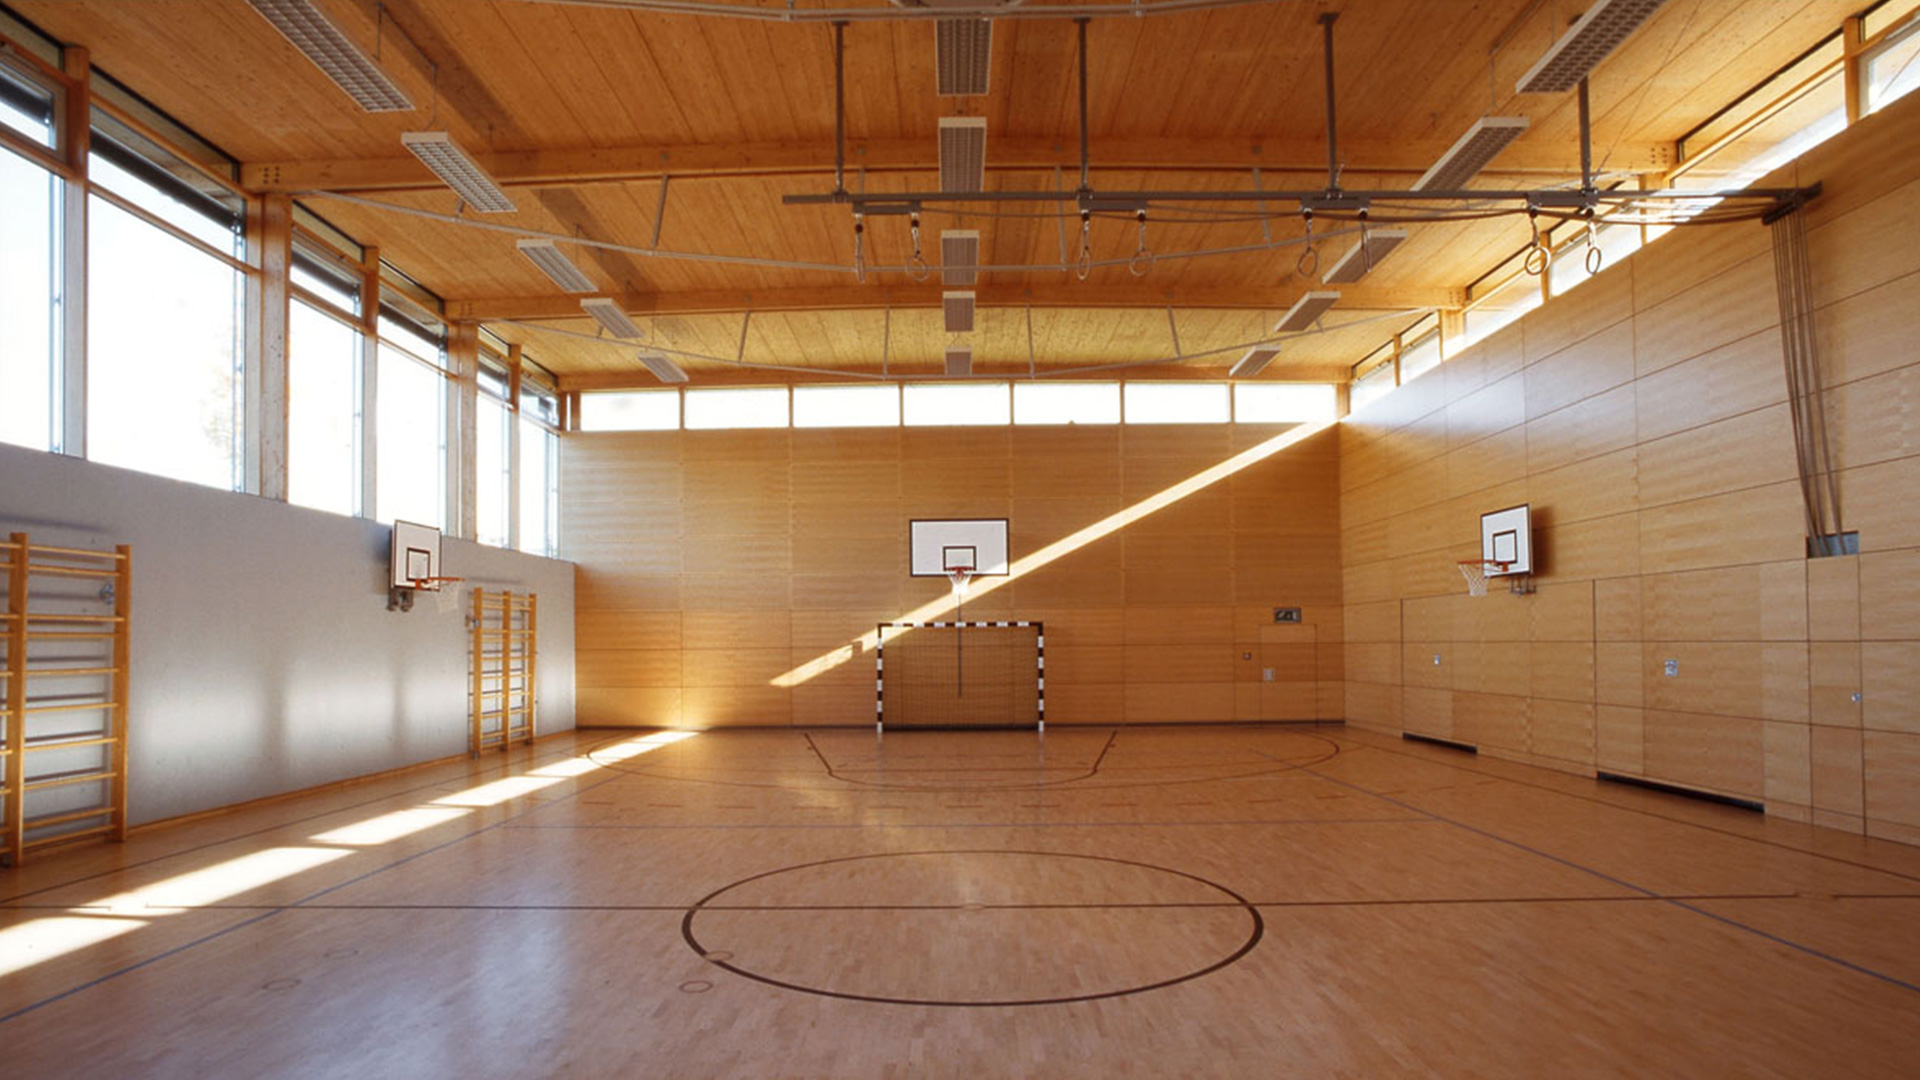 Sporthalle Trudering Halle